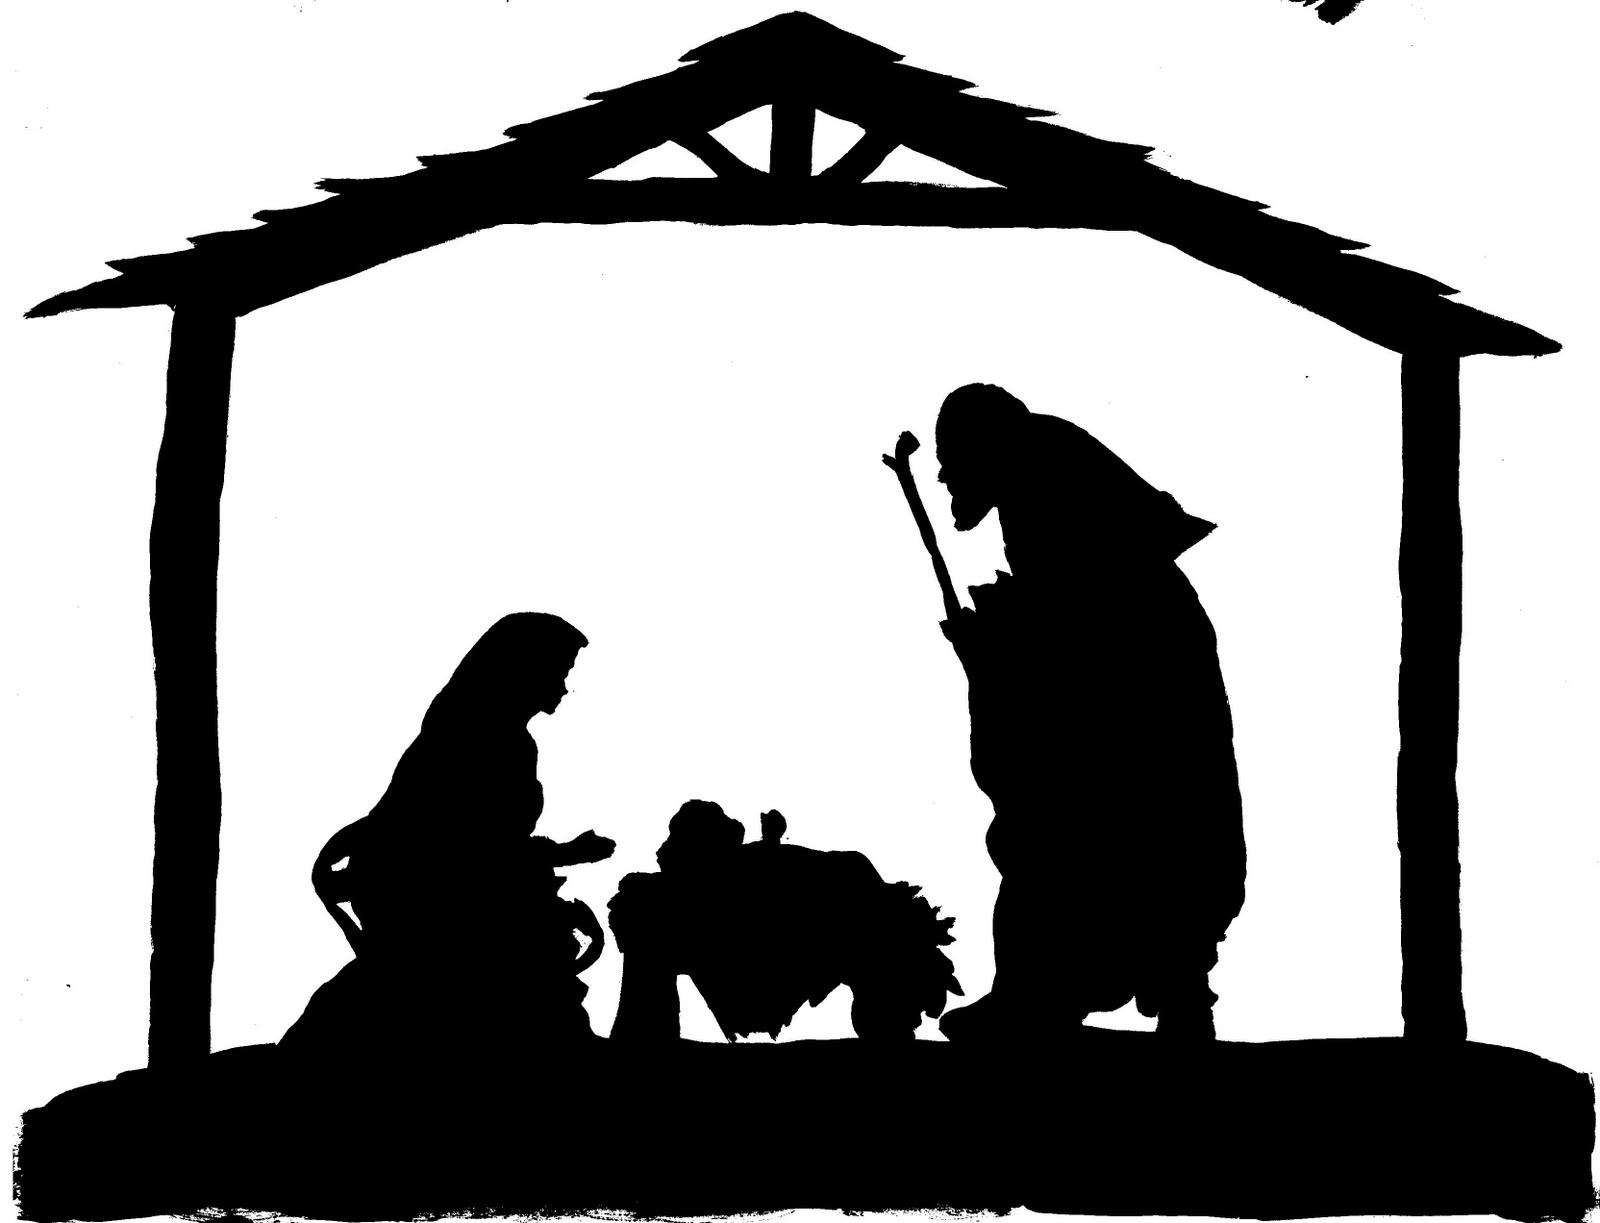 Nativity Silhouette Patterns - Clipart L-Nativity Silhouette Patterns - Clipart library-10